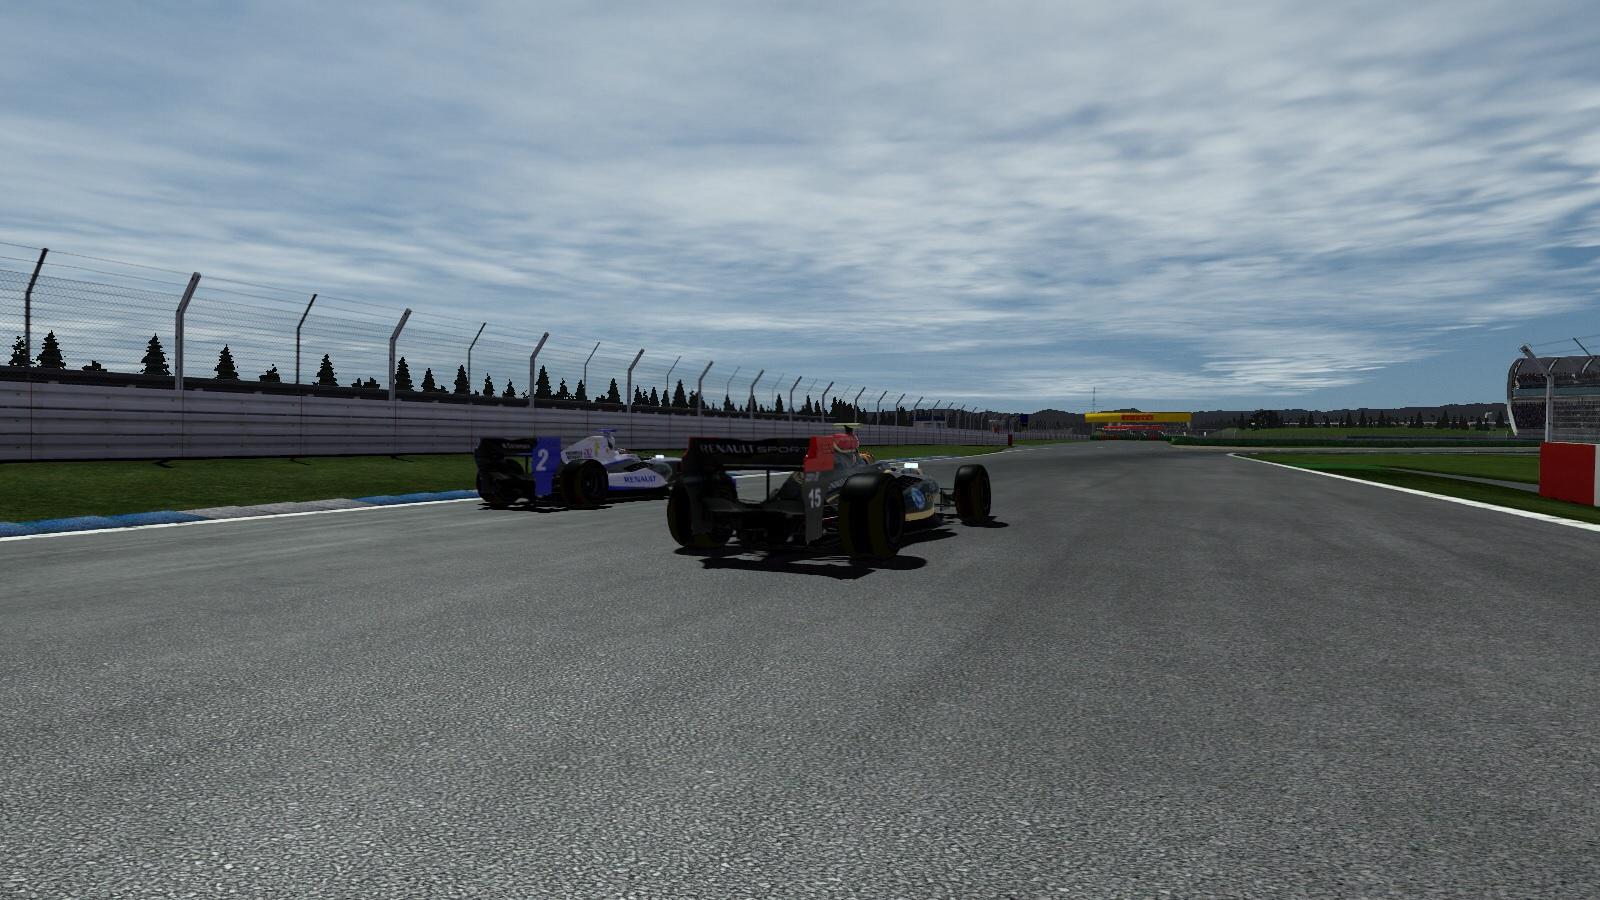 VWSR S4: Team Formation Race 2 - Sun 28th Sept 2014